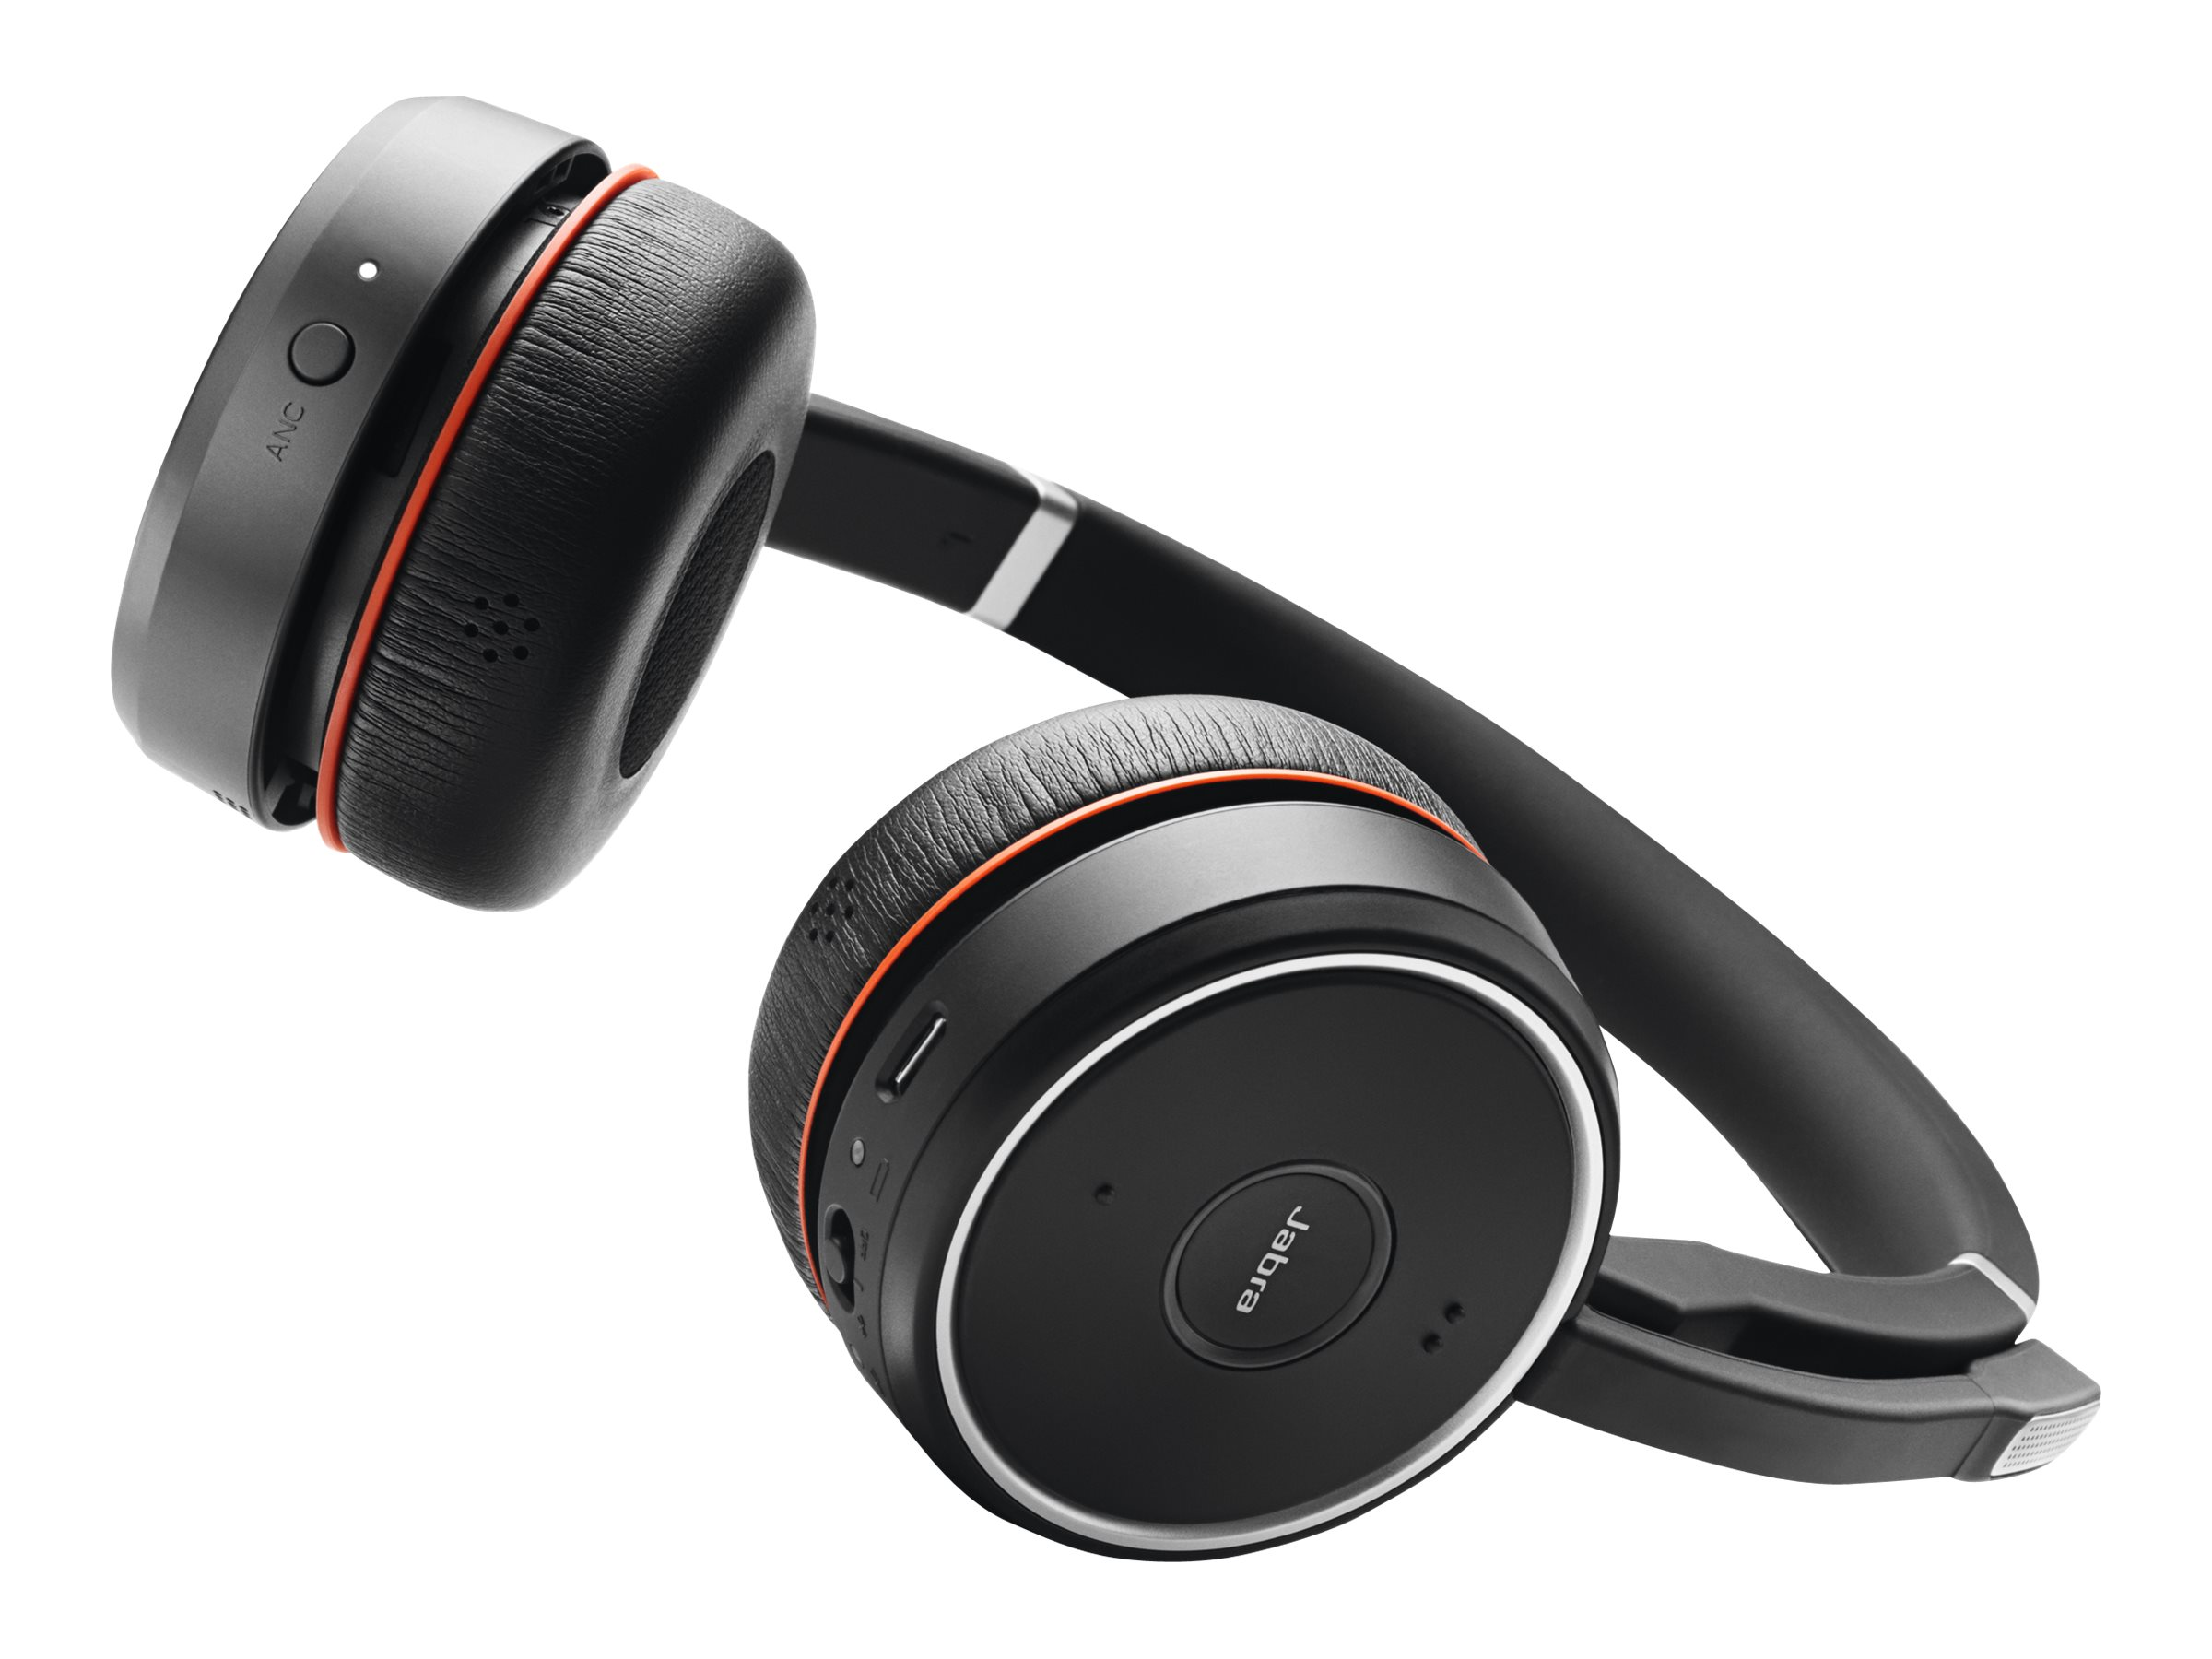 Jabra Evolve 75 UC Stereo - Headset - On-Ear - Bluetooth - kabellos - aktive Rauschunterdrückung